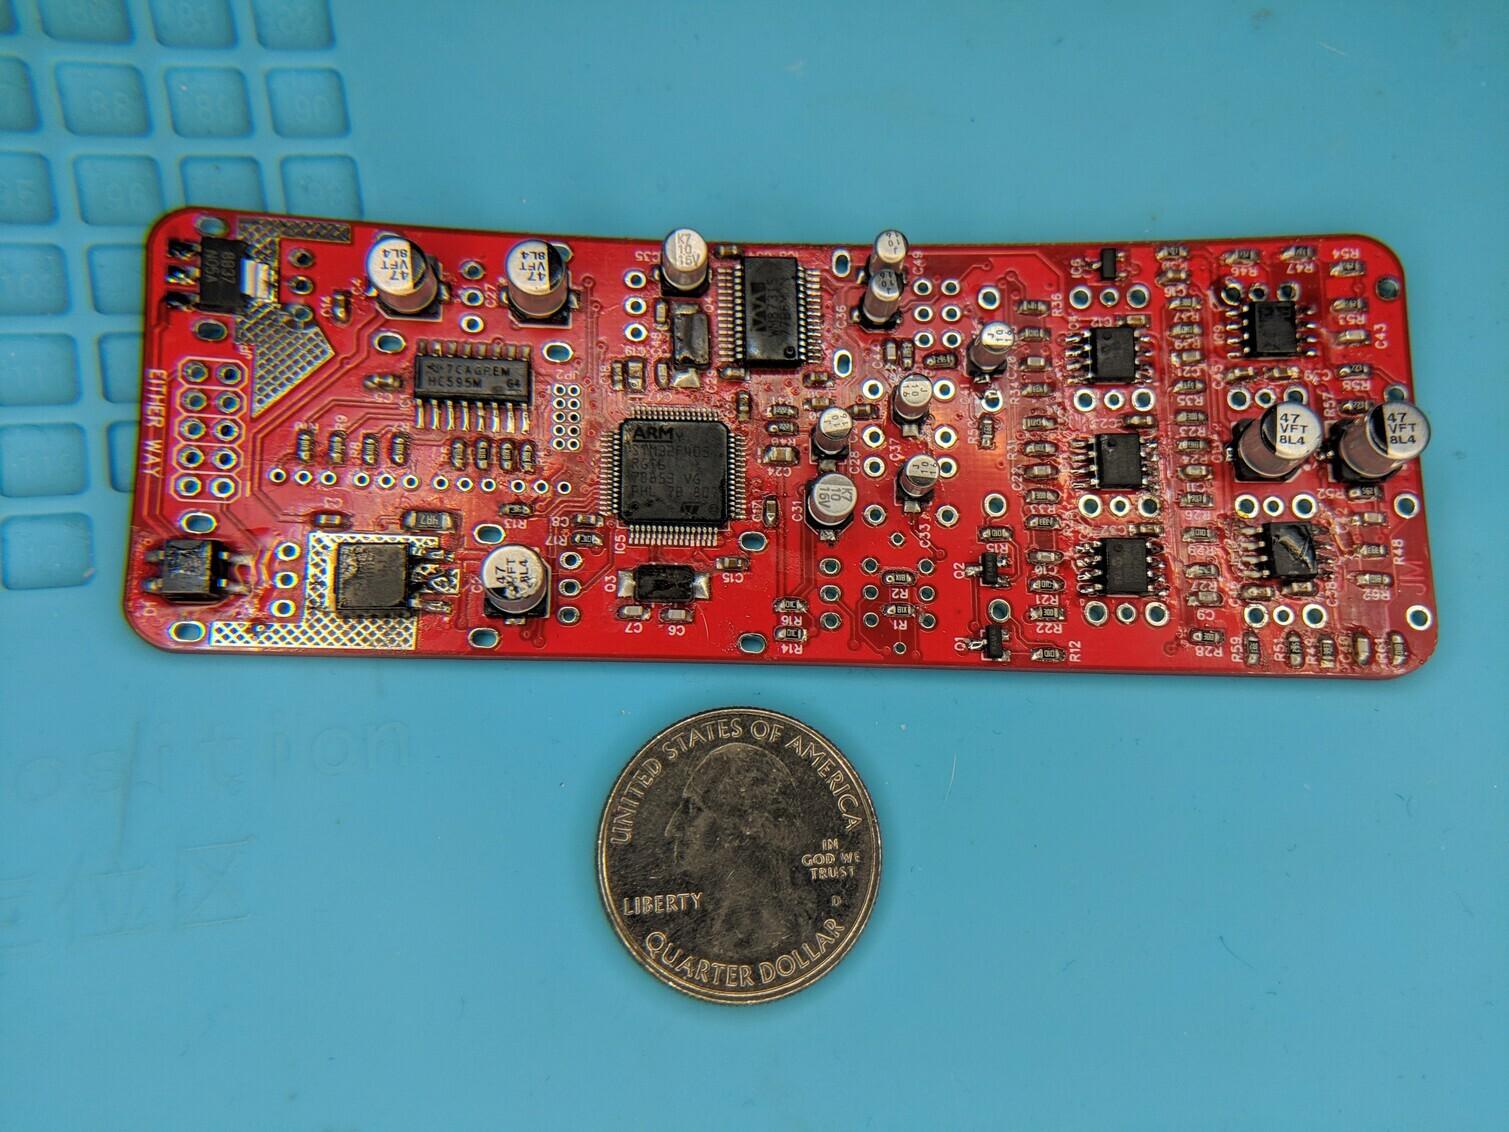 uBurst PCB back side assembly